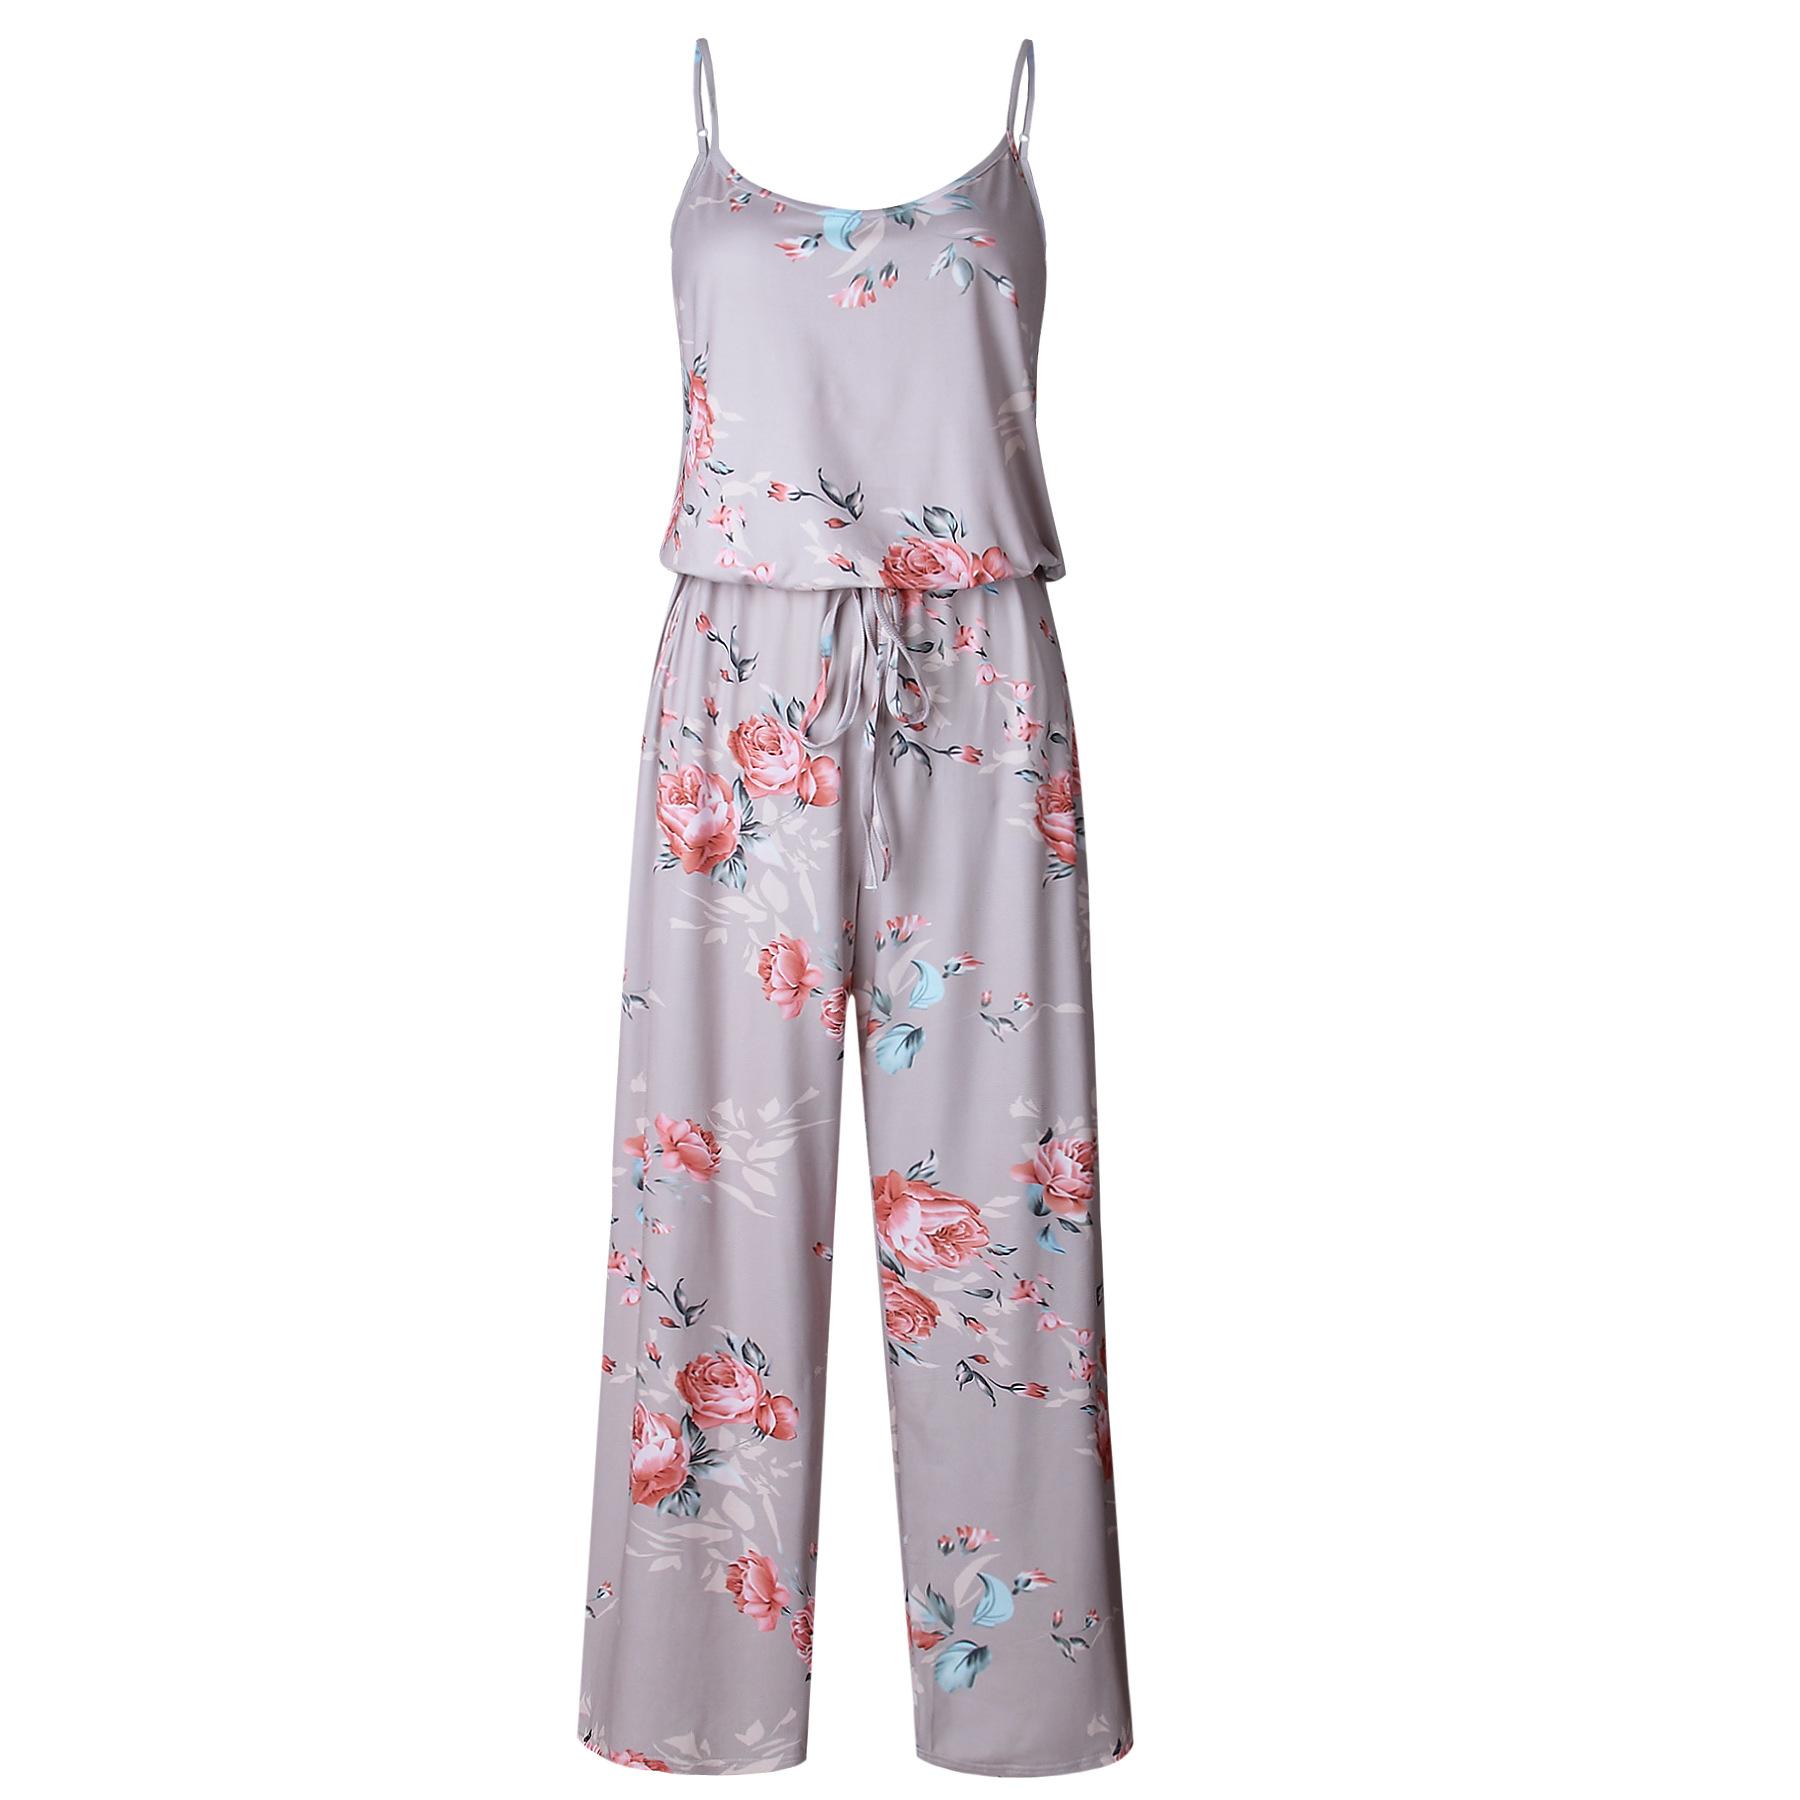 e7cd0daf1fd 2019 New Kawaii Floral Jumpsuit Trendy Women Spaghetti Strap Long ...